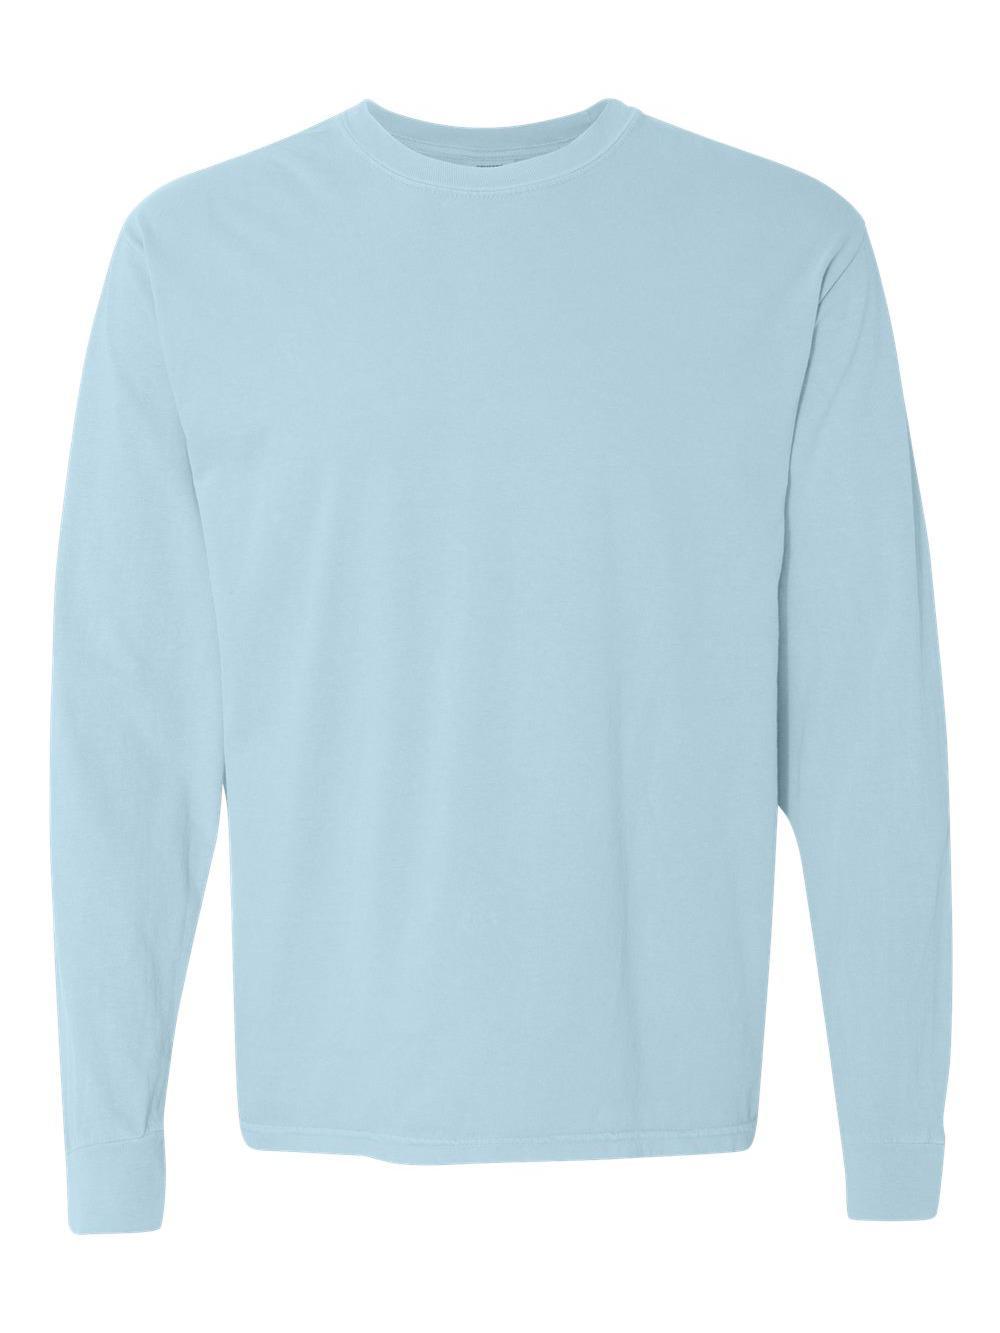 Comfort-Colors-Garment-Dyed-Heavyweight-Ringspun-Long-Sleeve-T-Shirt-6014 thumbnail 27